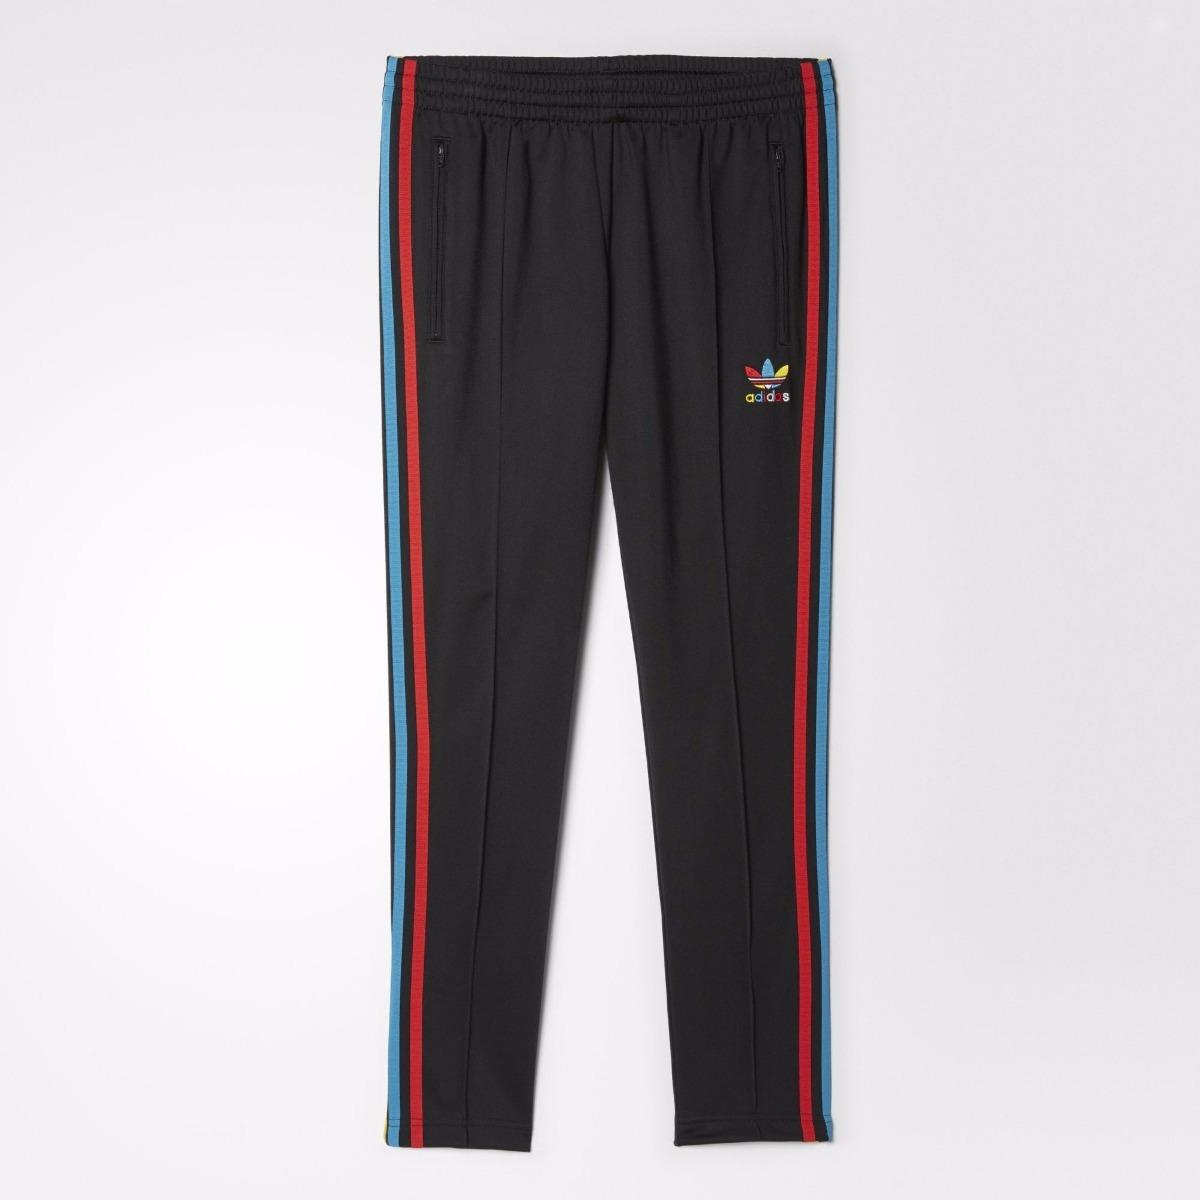 1 Originales Originals Adidas 6r06qb 249 Mujer Pantalones Negros Sst 00 gnSt71a